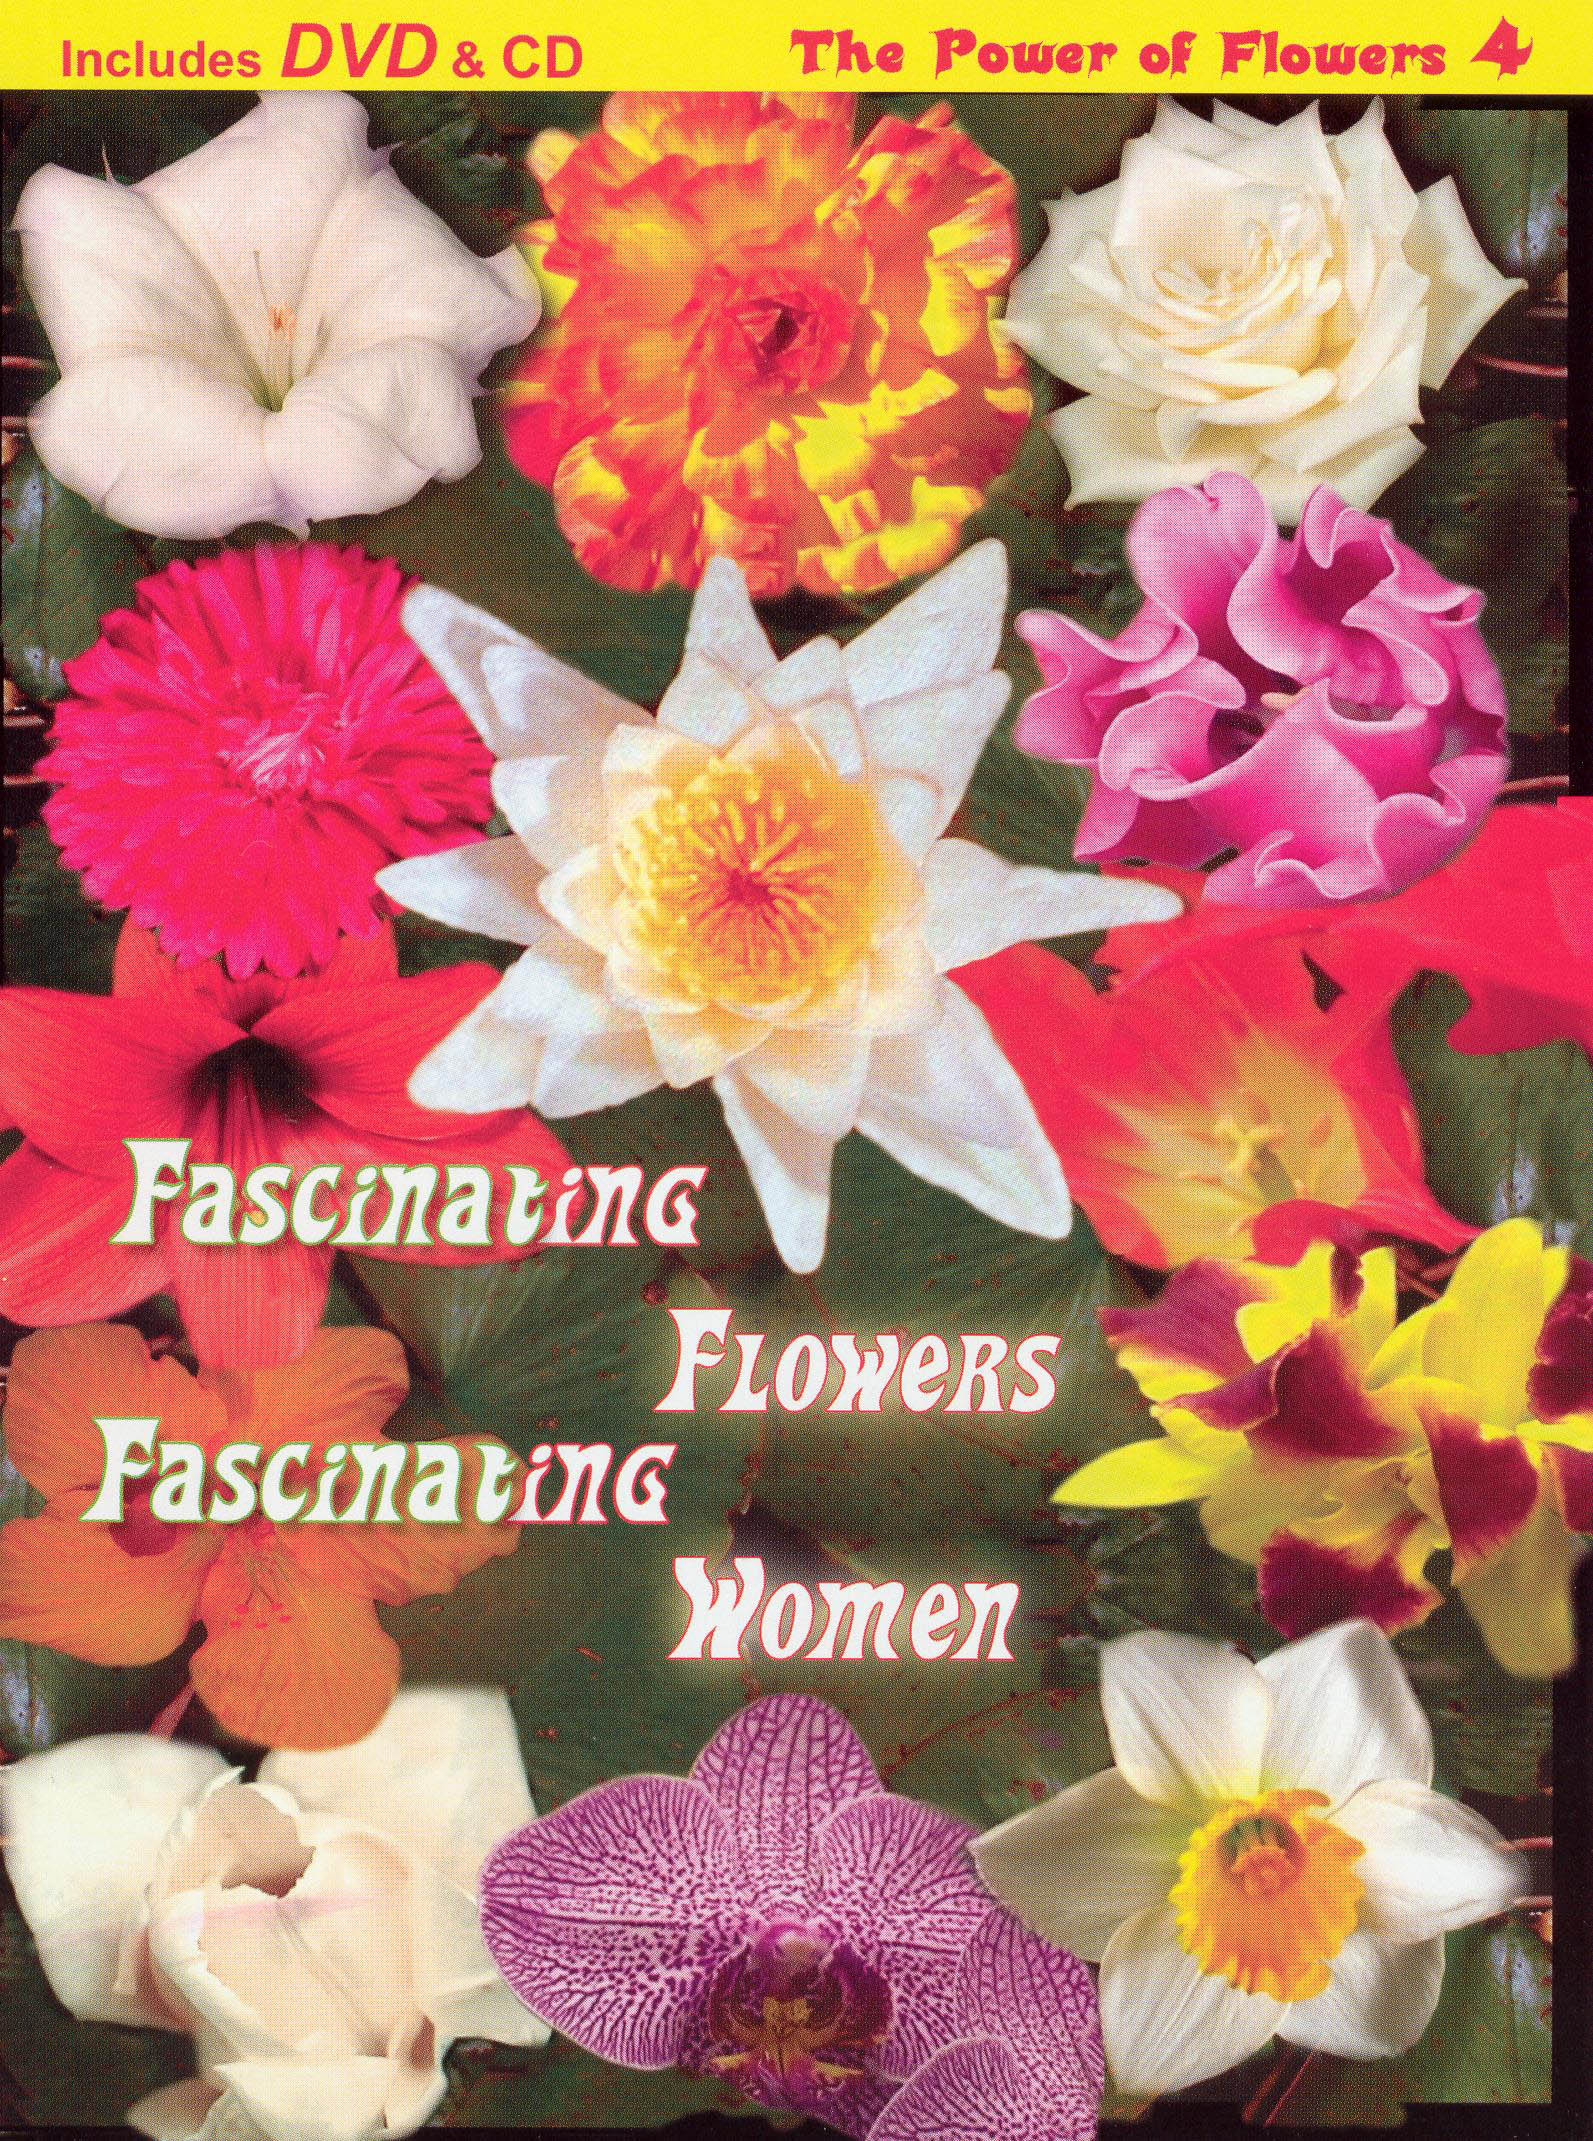 The Power of Flowers, Vol. 4: Fascinating Flowers, Fascinating Women